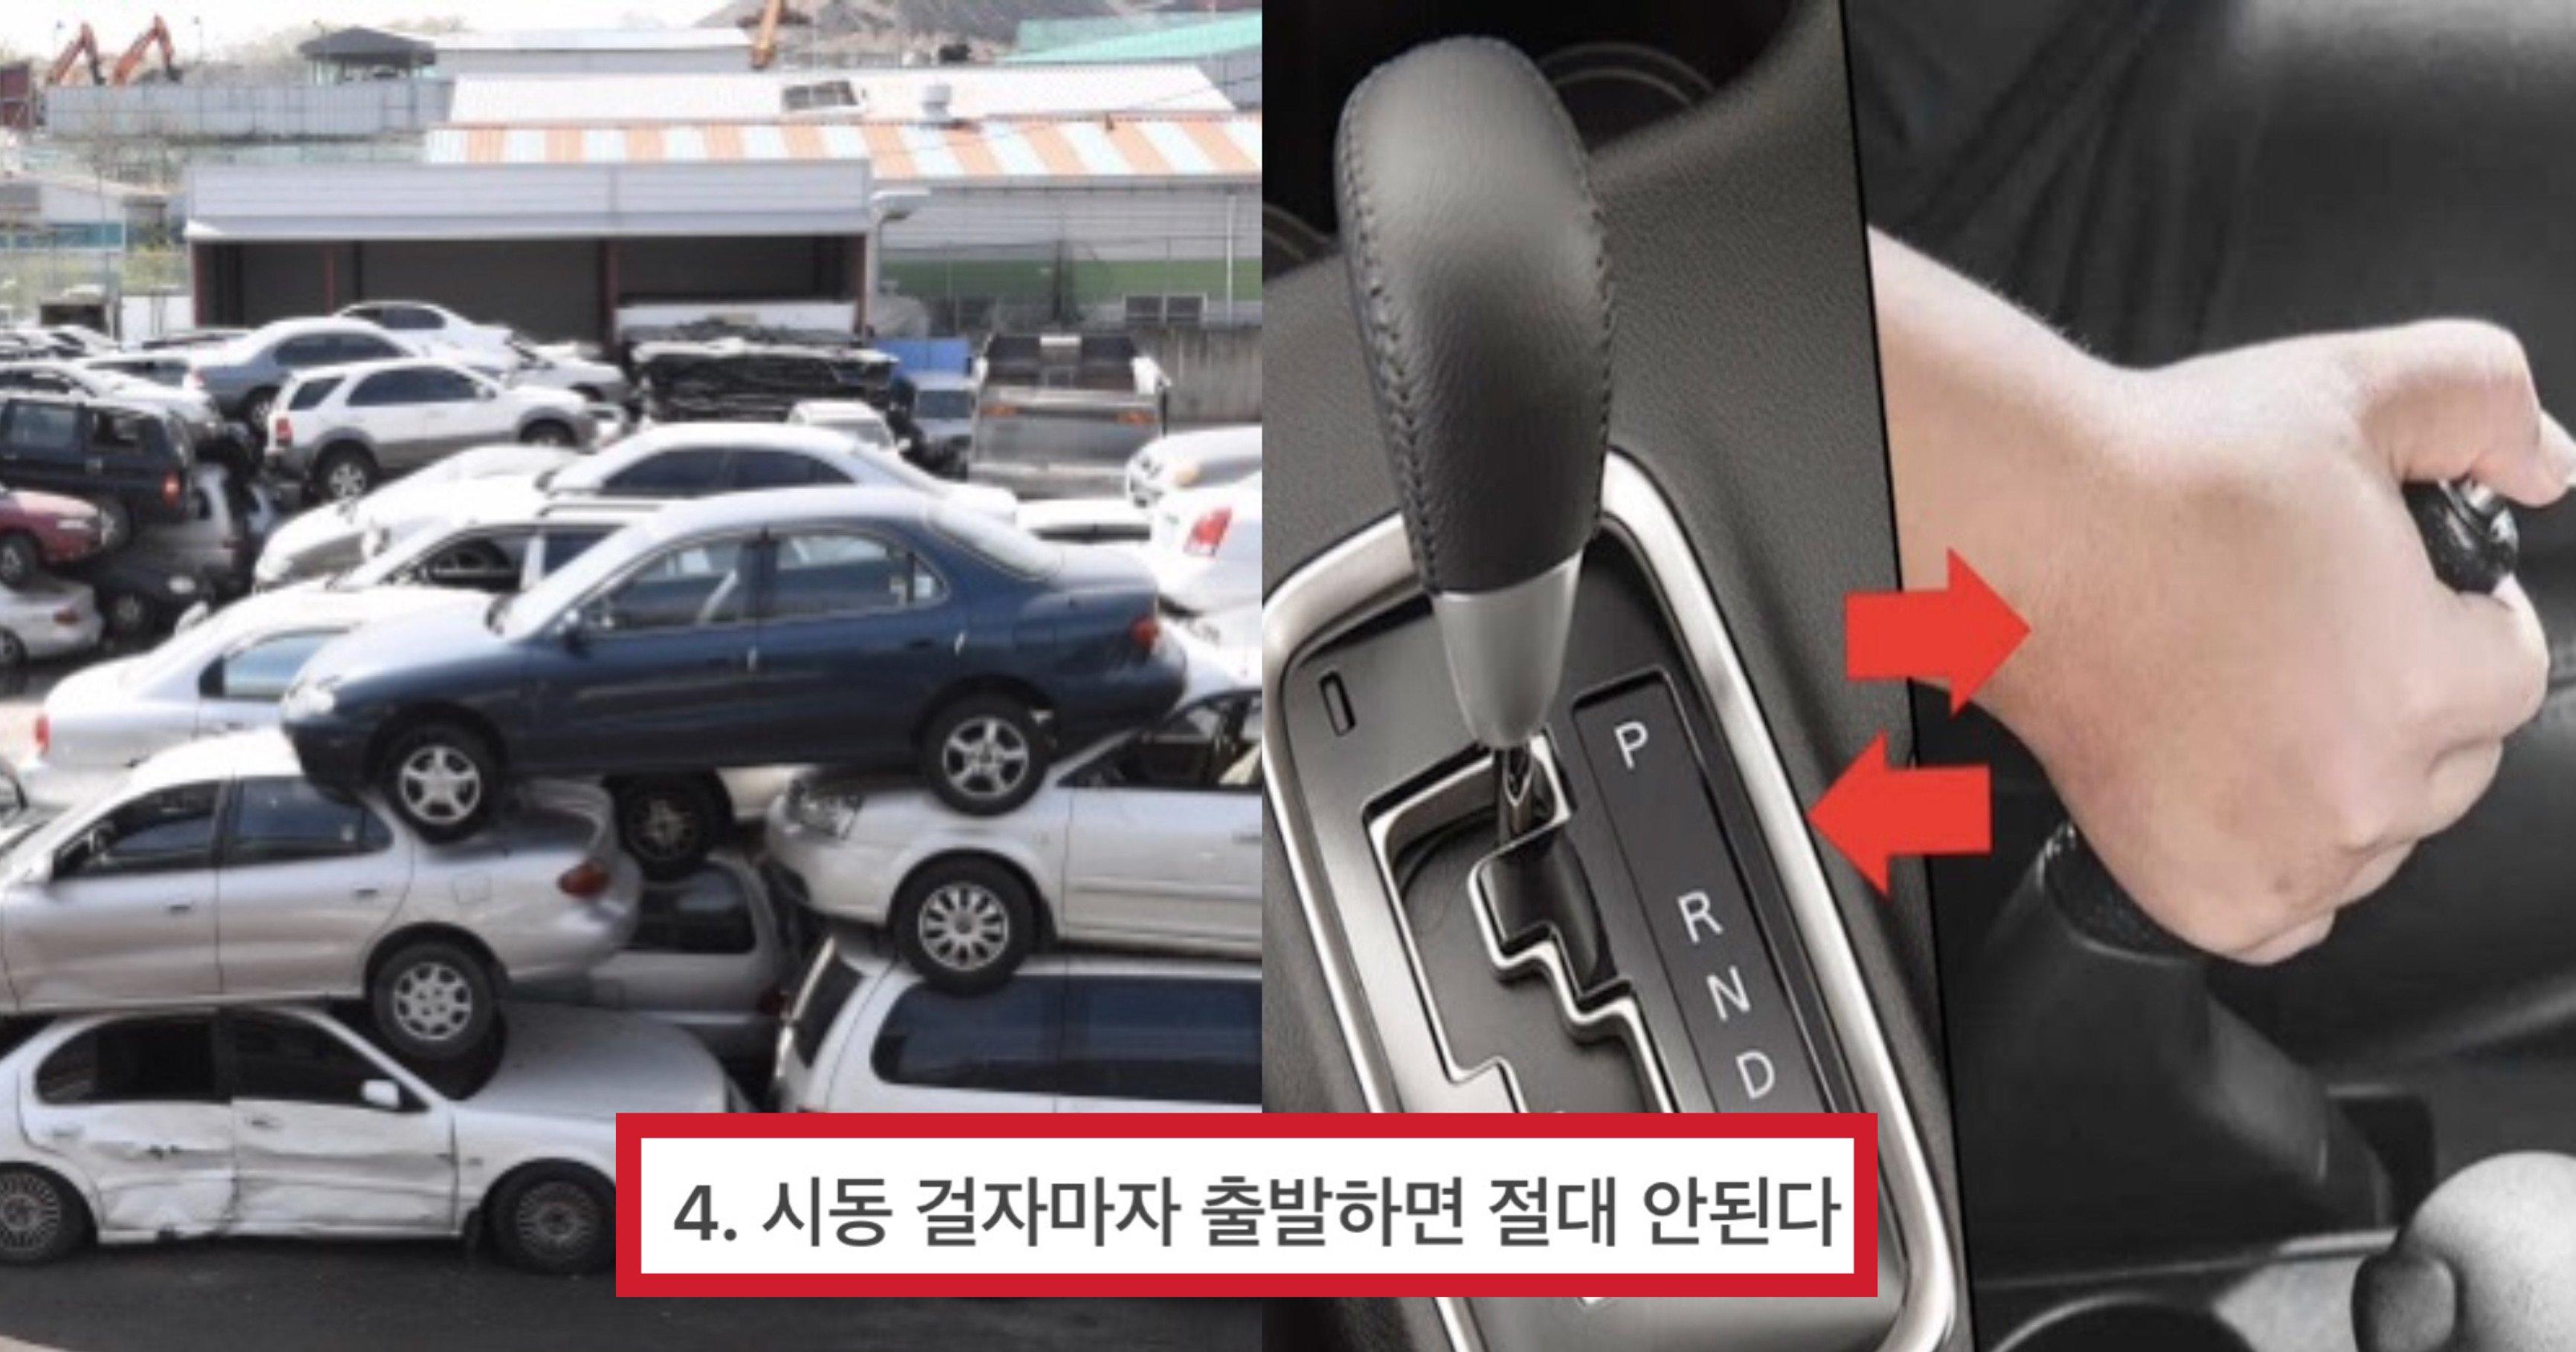 "2536e111 b7c7 4628 bffb ec602bd38c7b.jpeg?resize=412,232 - ""여러분 이렇게 할 때마다 차 망가져요..""..대부분의 사람들이 잘 몰라서 '차' 망가트리고 있다는 잘못된 운전습관 5가지"